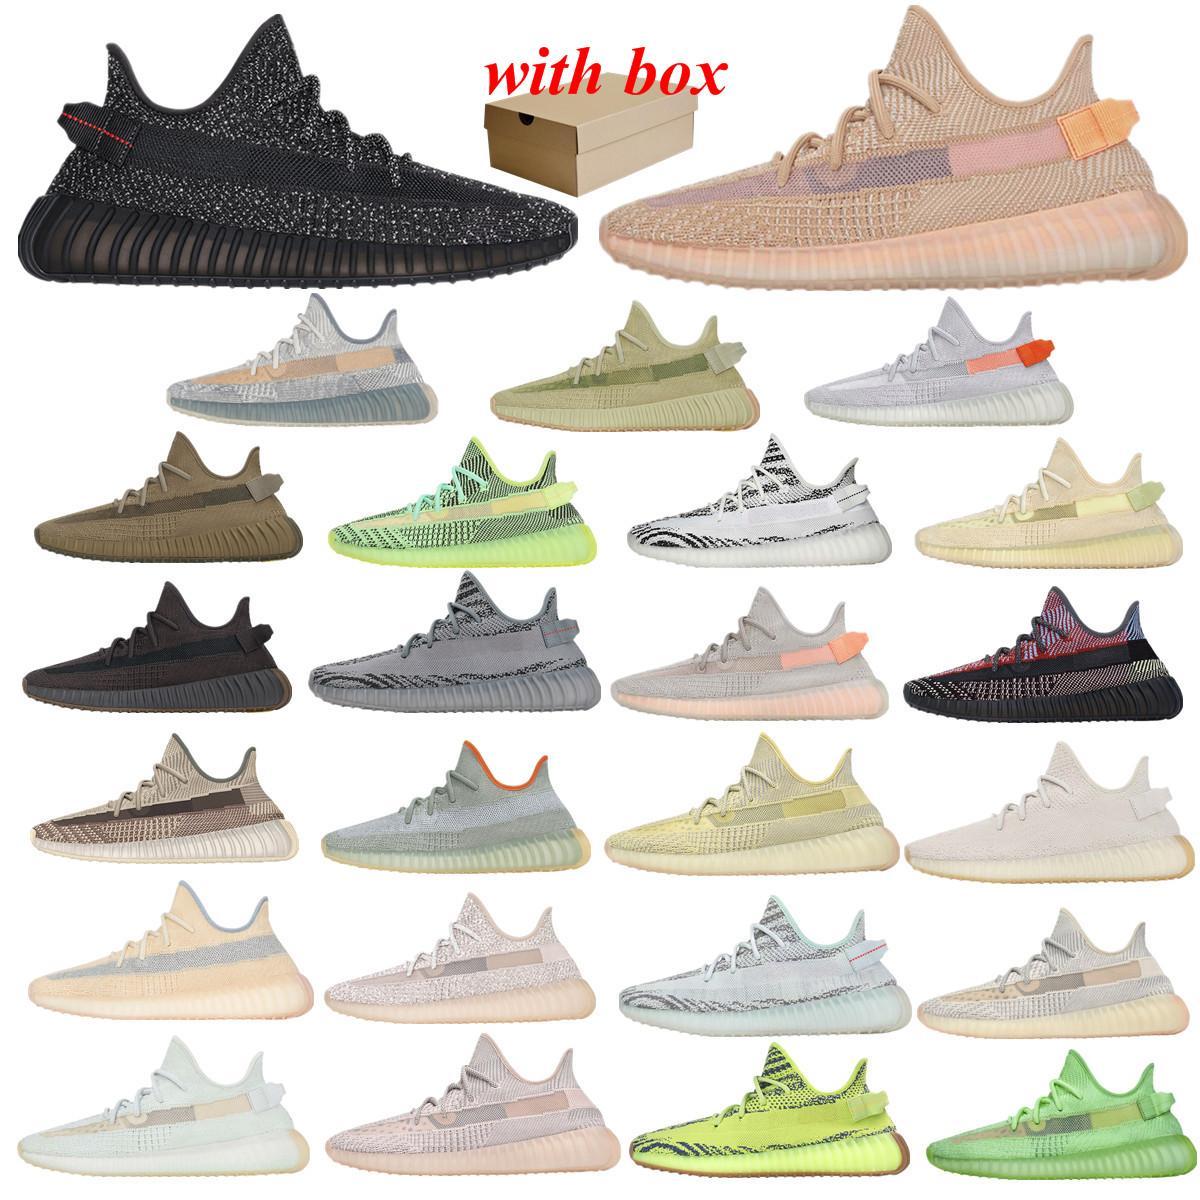 Kanye Static 3M Reflexivo Run Sapatos Casuais Belgua 2.0 Semi Frozen Yellow com Box Designer Homens Mulheres Treinador Sneakers EUR 36-46